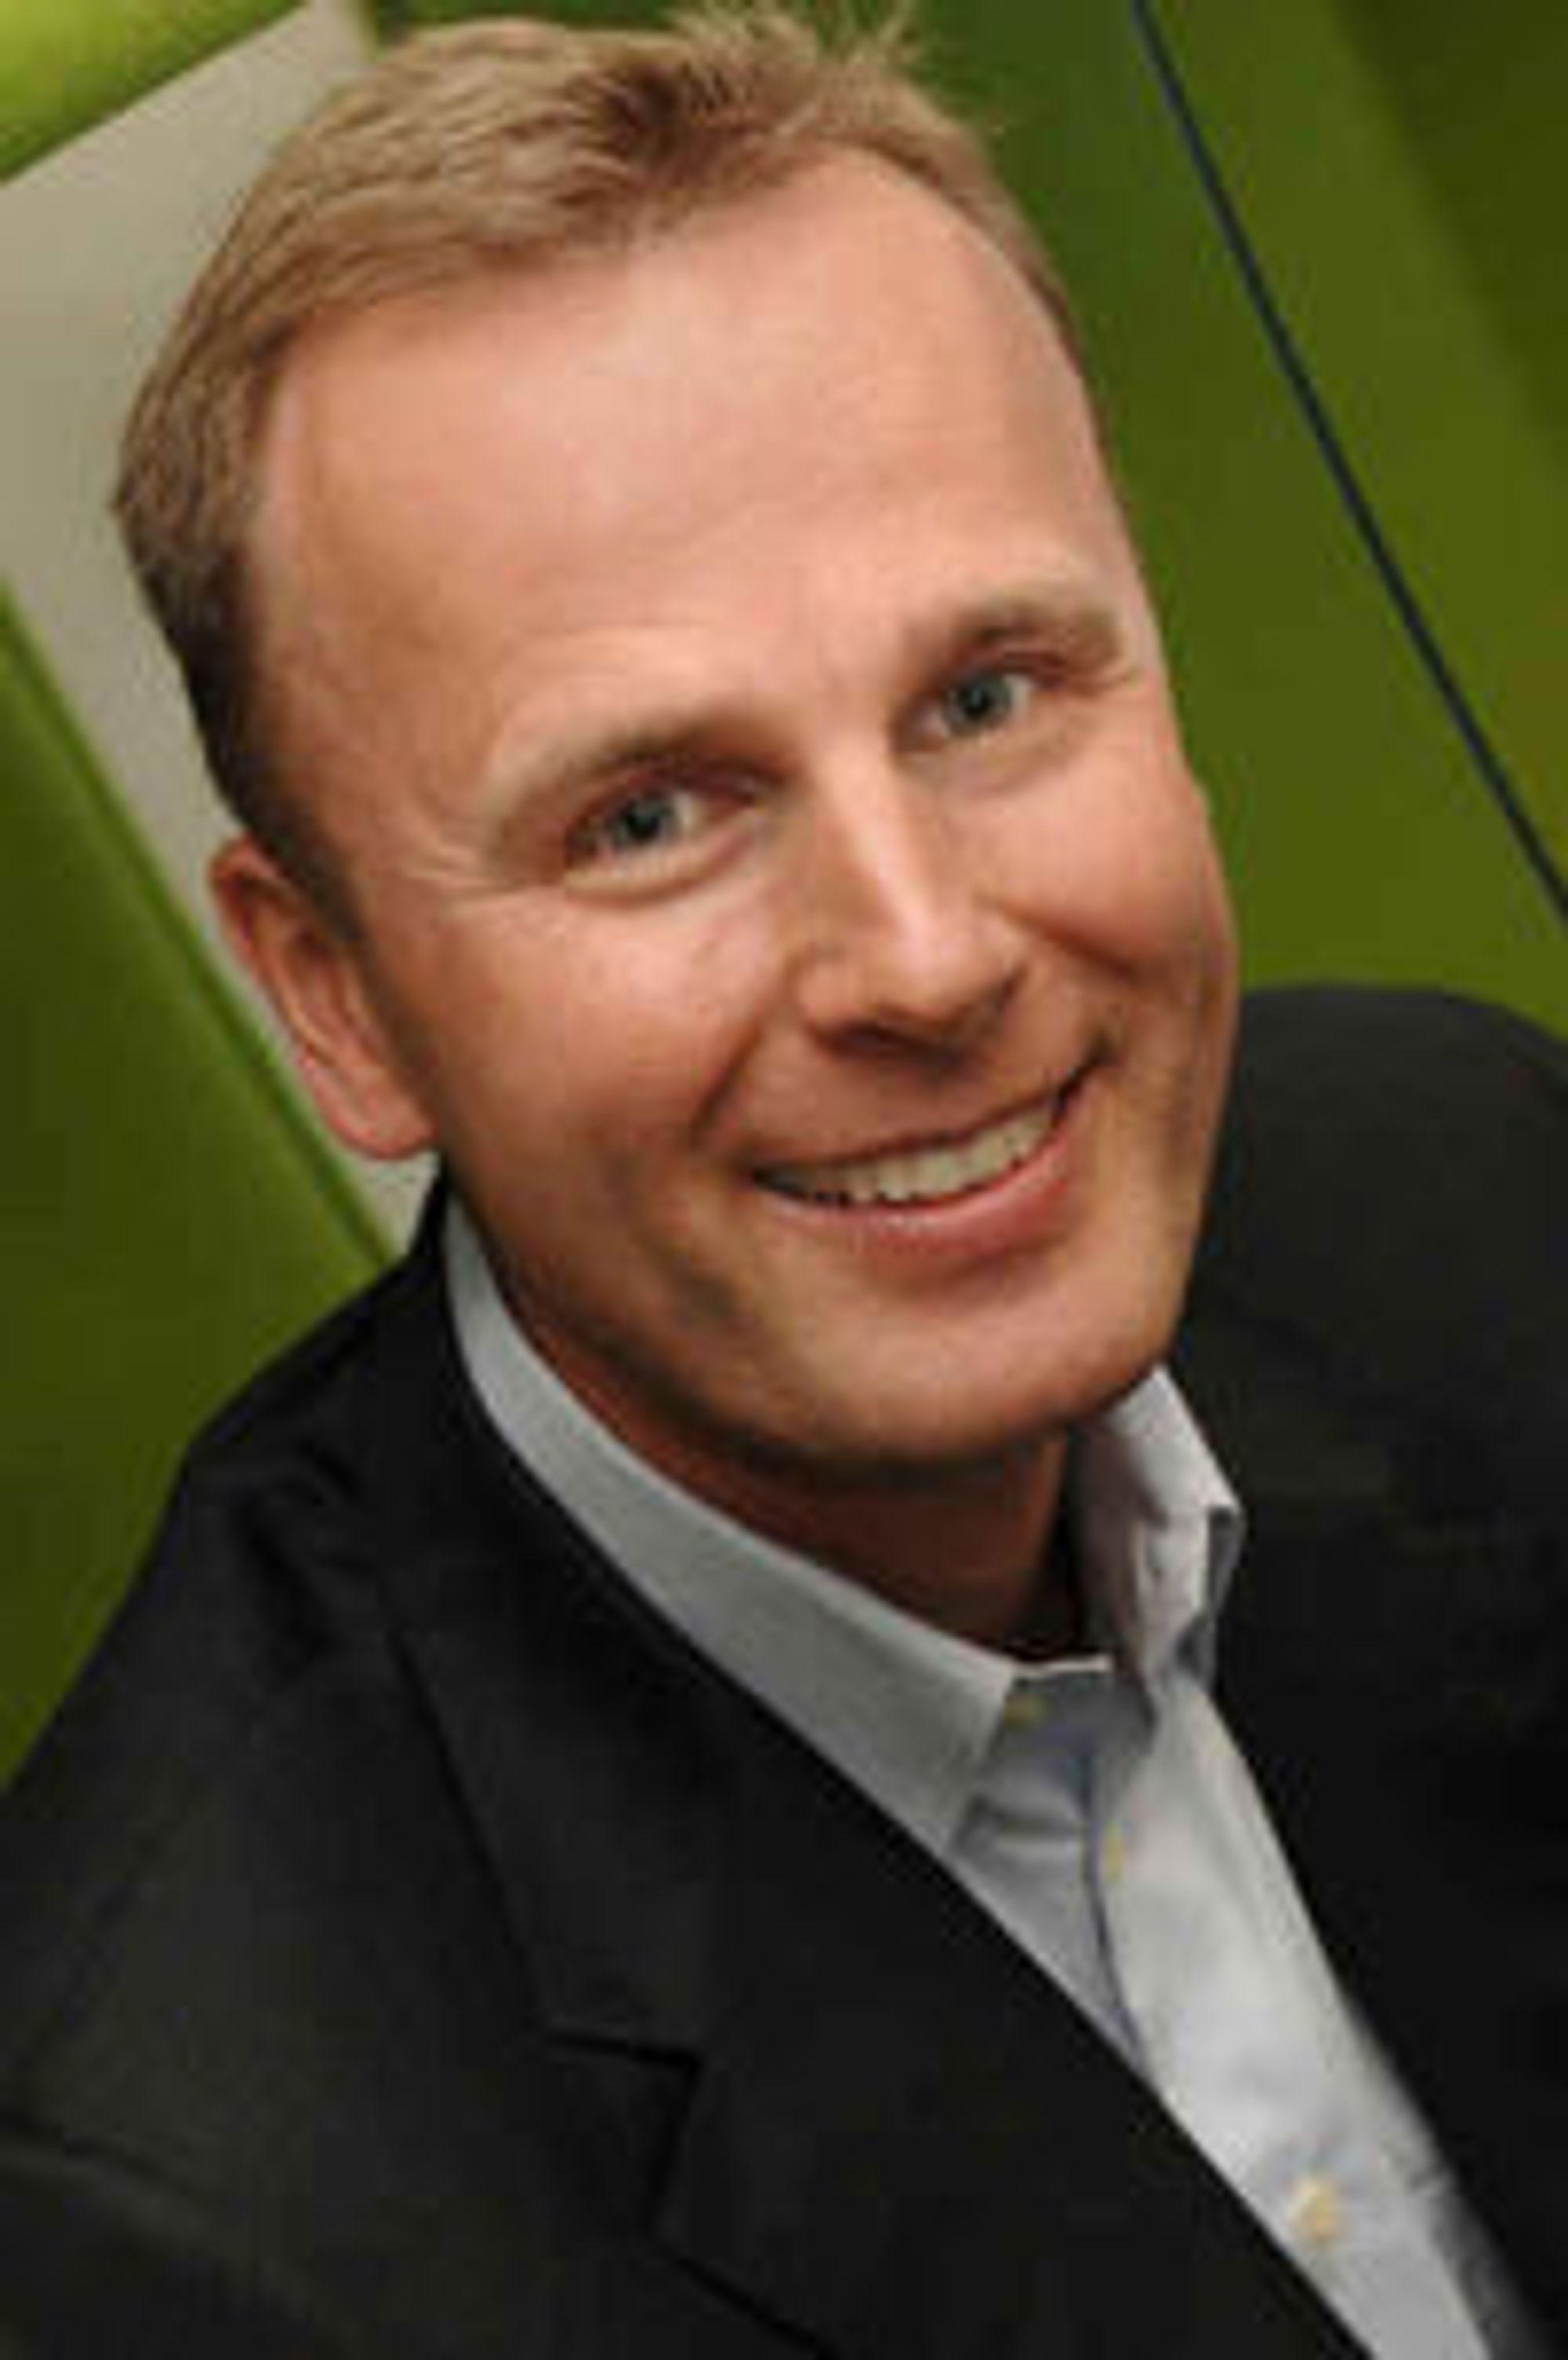 Tidligere Sun-sjef Knut Alnæs skal nå lede Citrix i Norge.